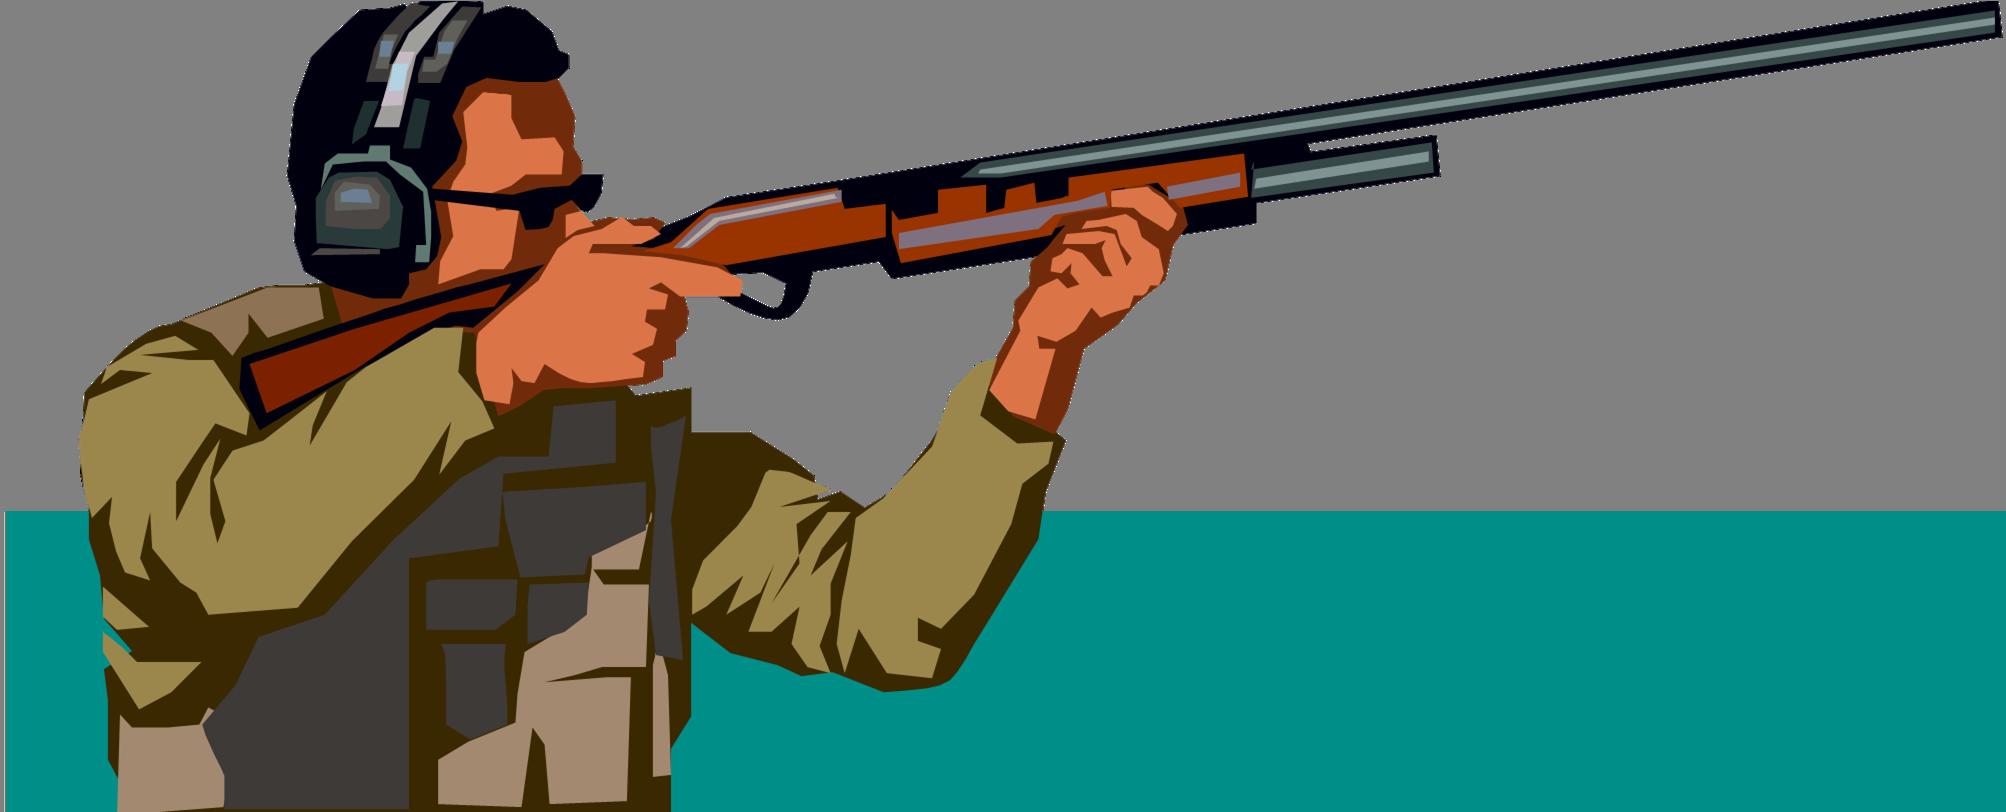 clip free library Guns clipart gun shooting.  collection of rifle